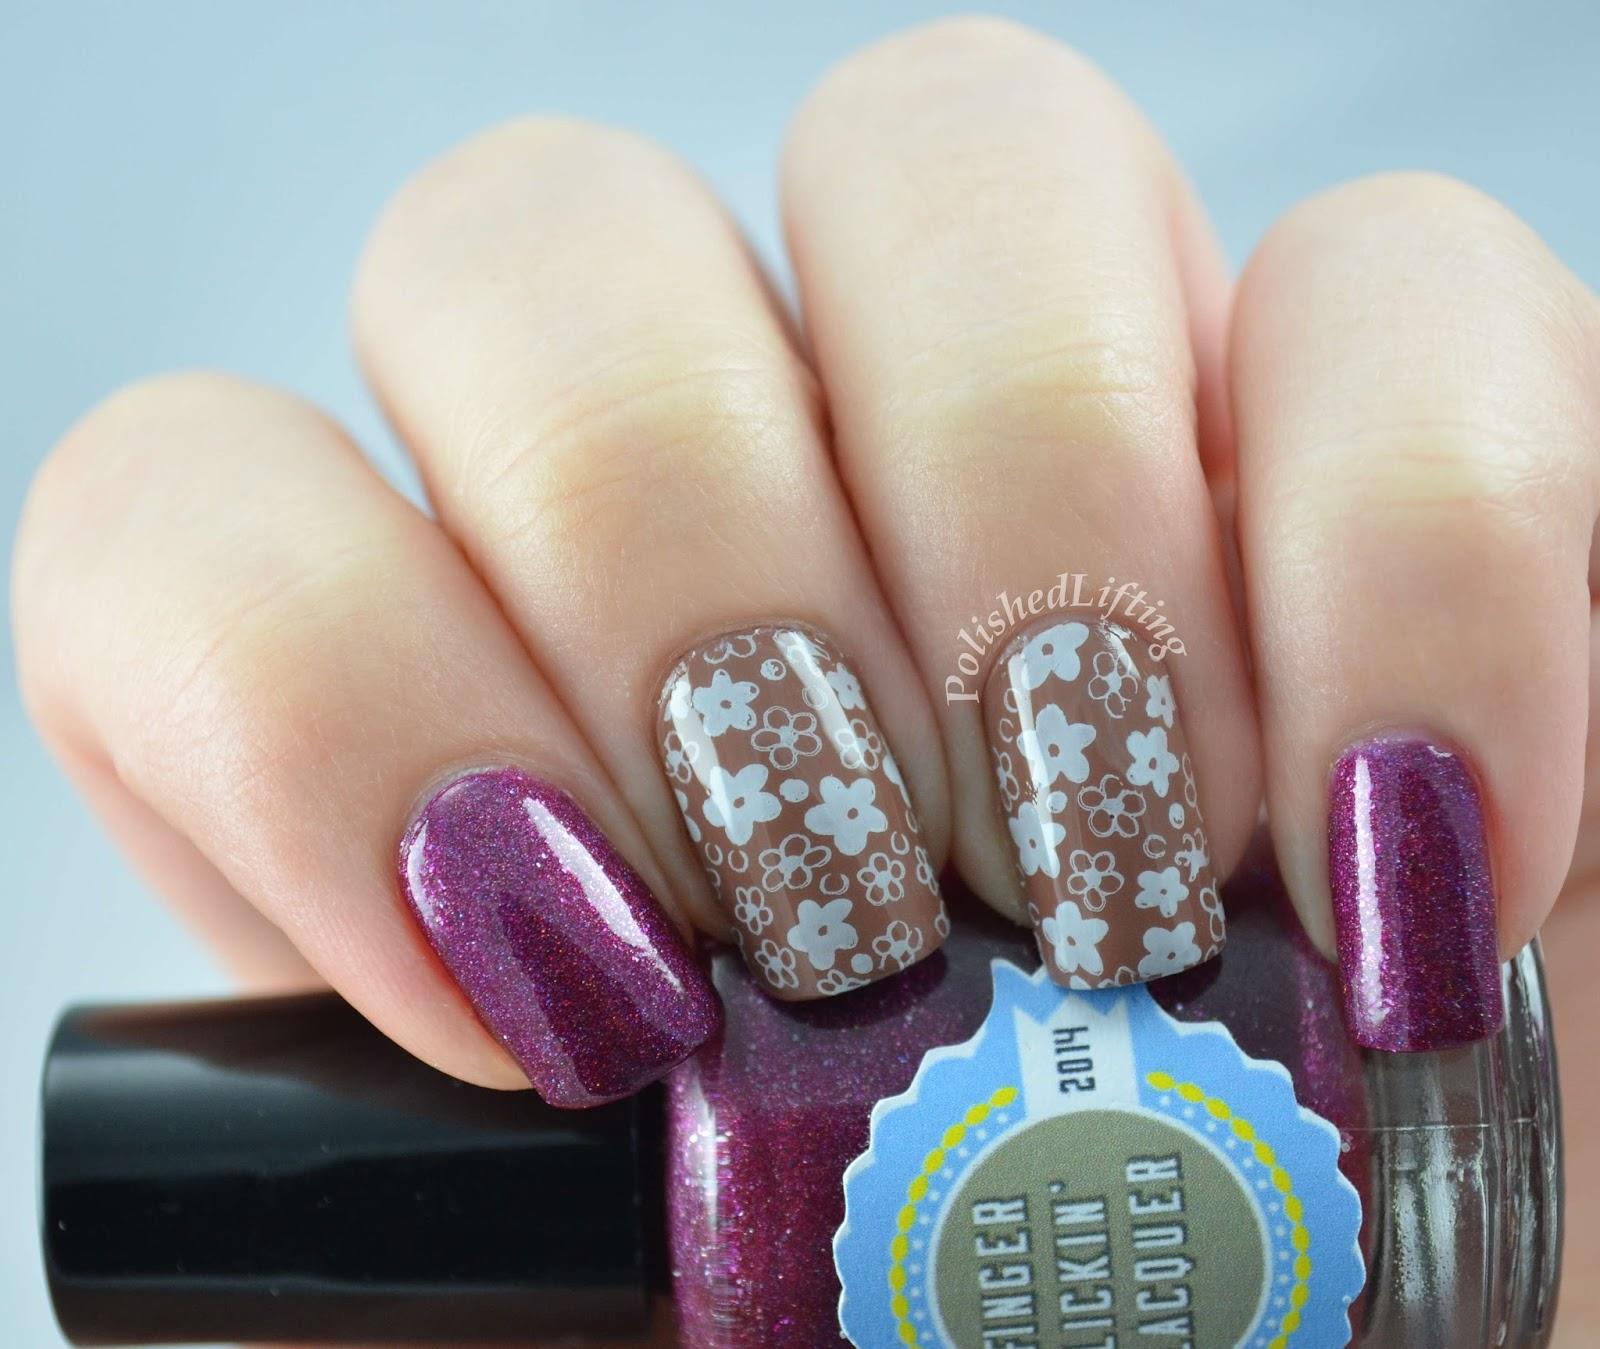 Finger Lickin' Lacquer custom Crimson Flakes Zoya Chantelle Sinful Colors Snow Me White